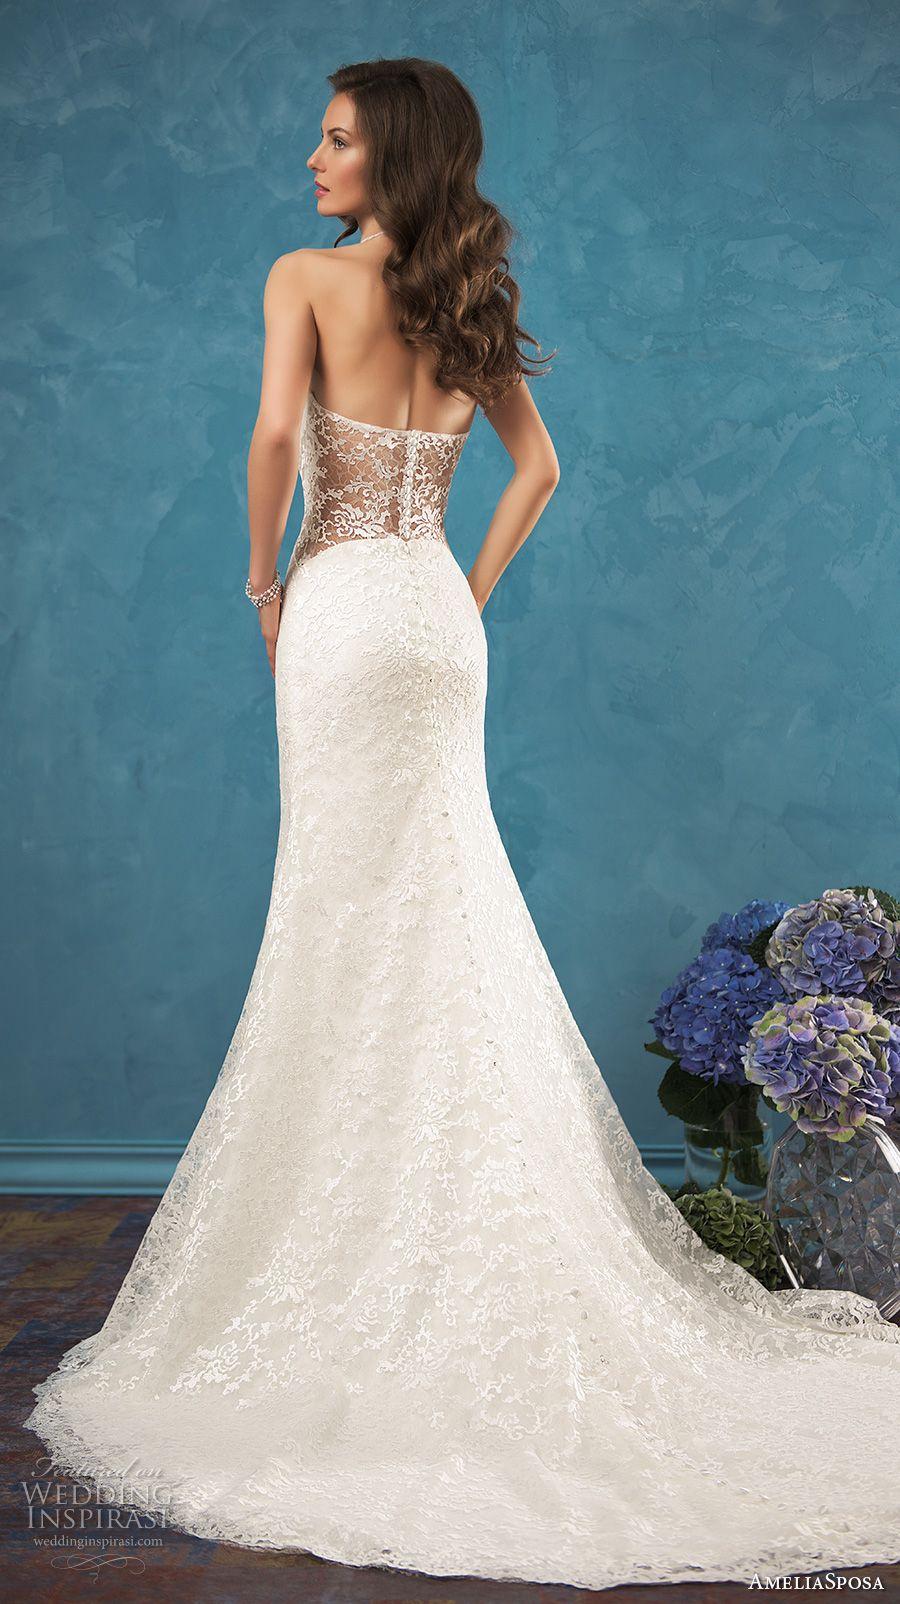 Amelia Sposa 2017 Wedding Dresses   Vestidos de novia, De novia y Novios